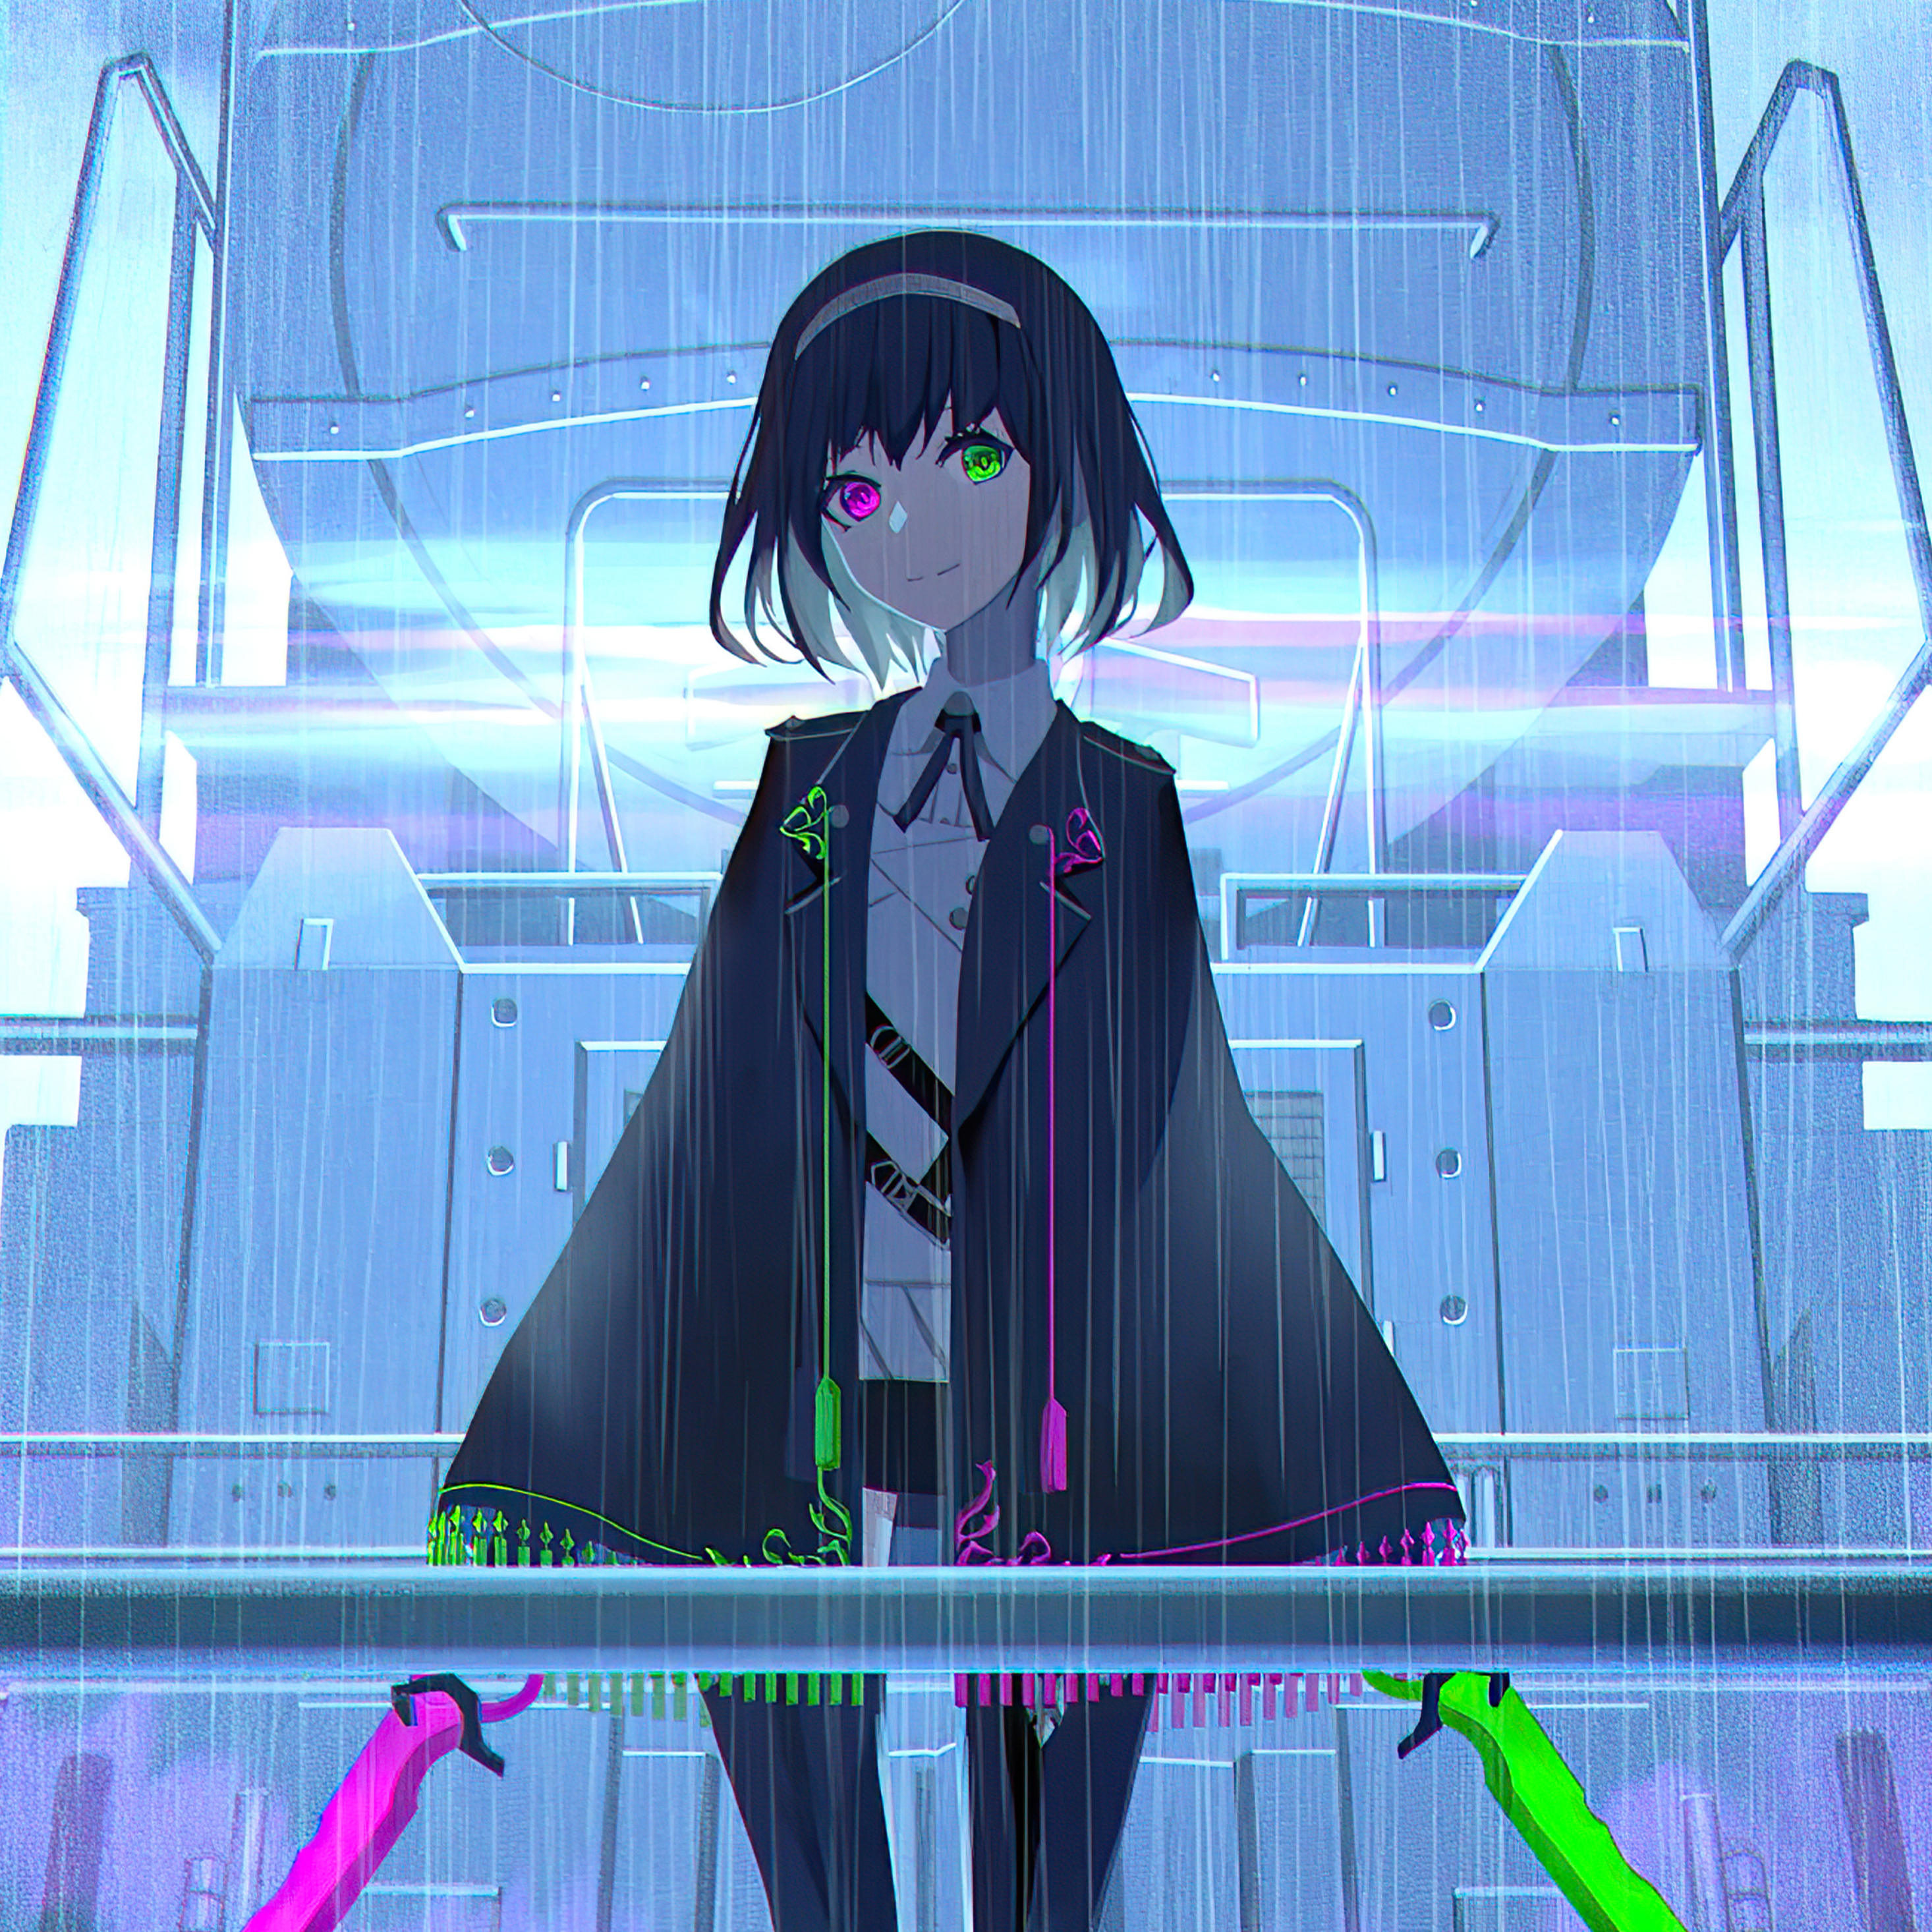 2932x2932 Anime Girl With Two Swords 4k Ipad Pro Retina ...